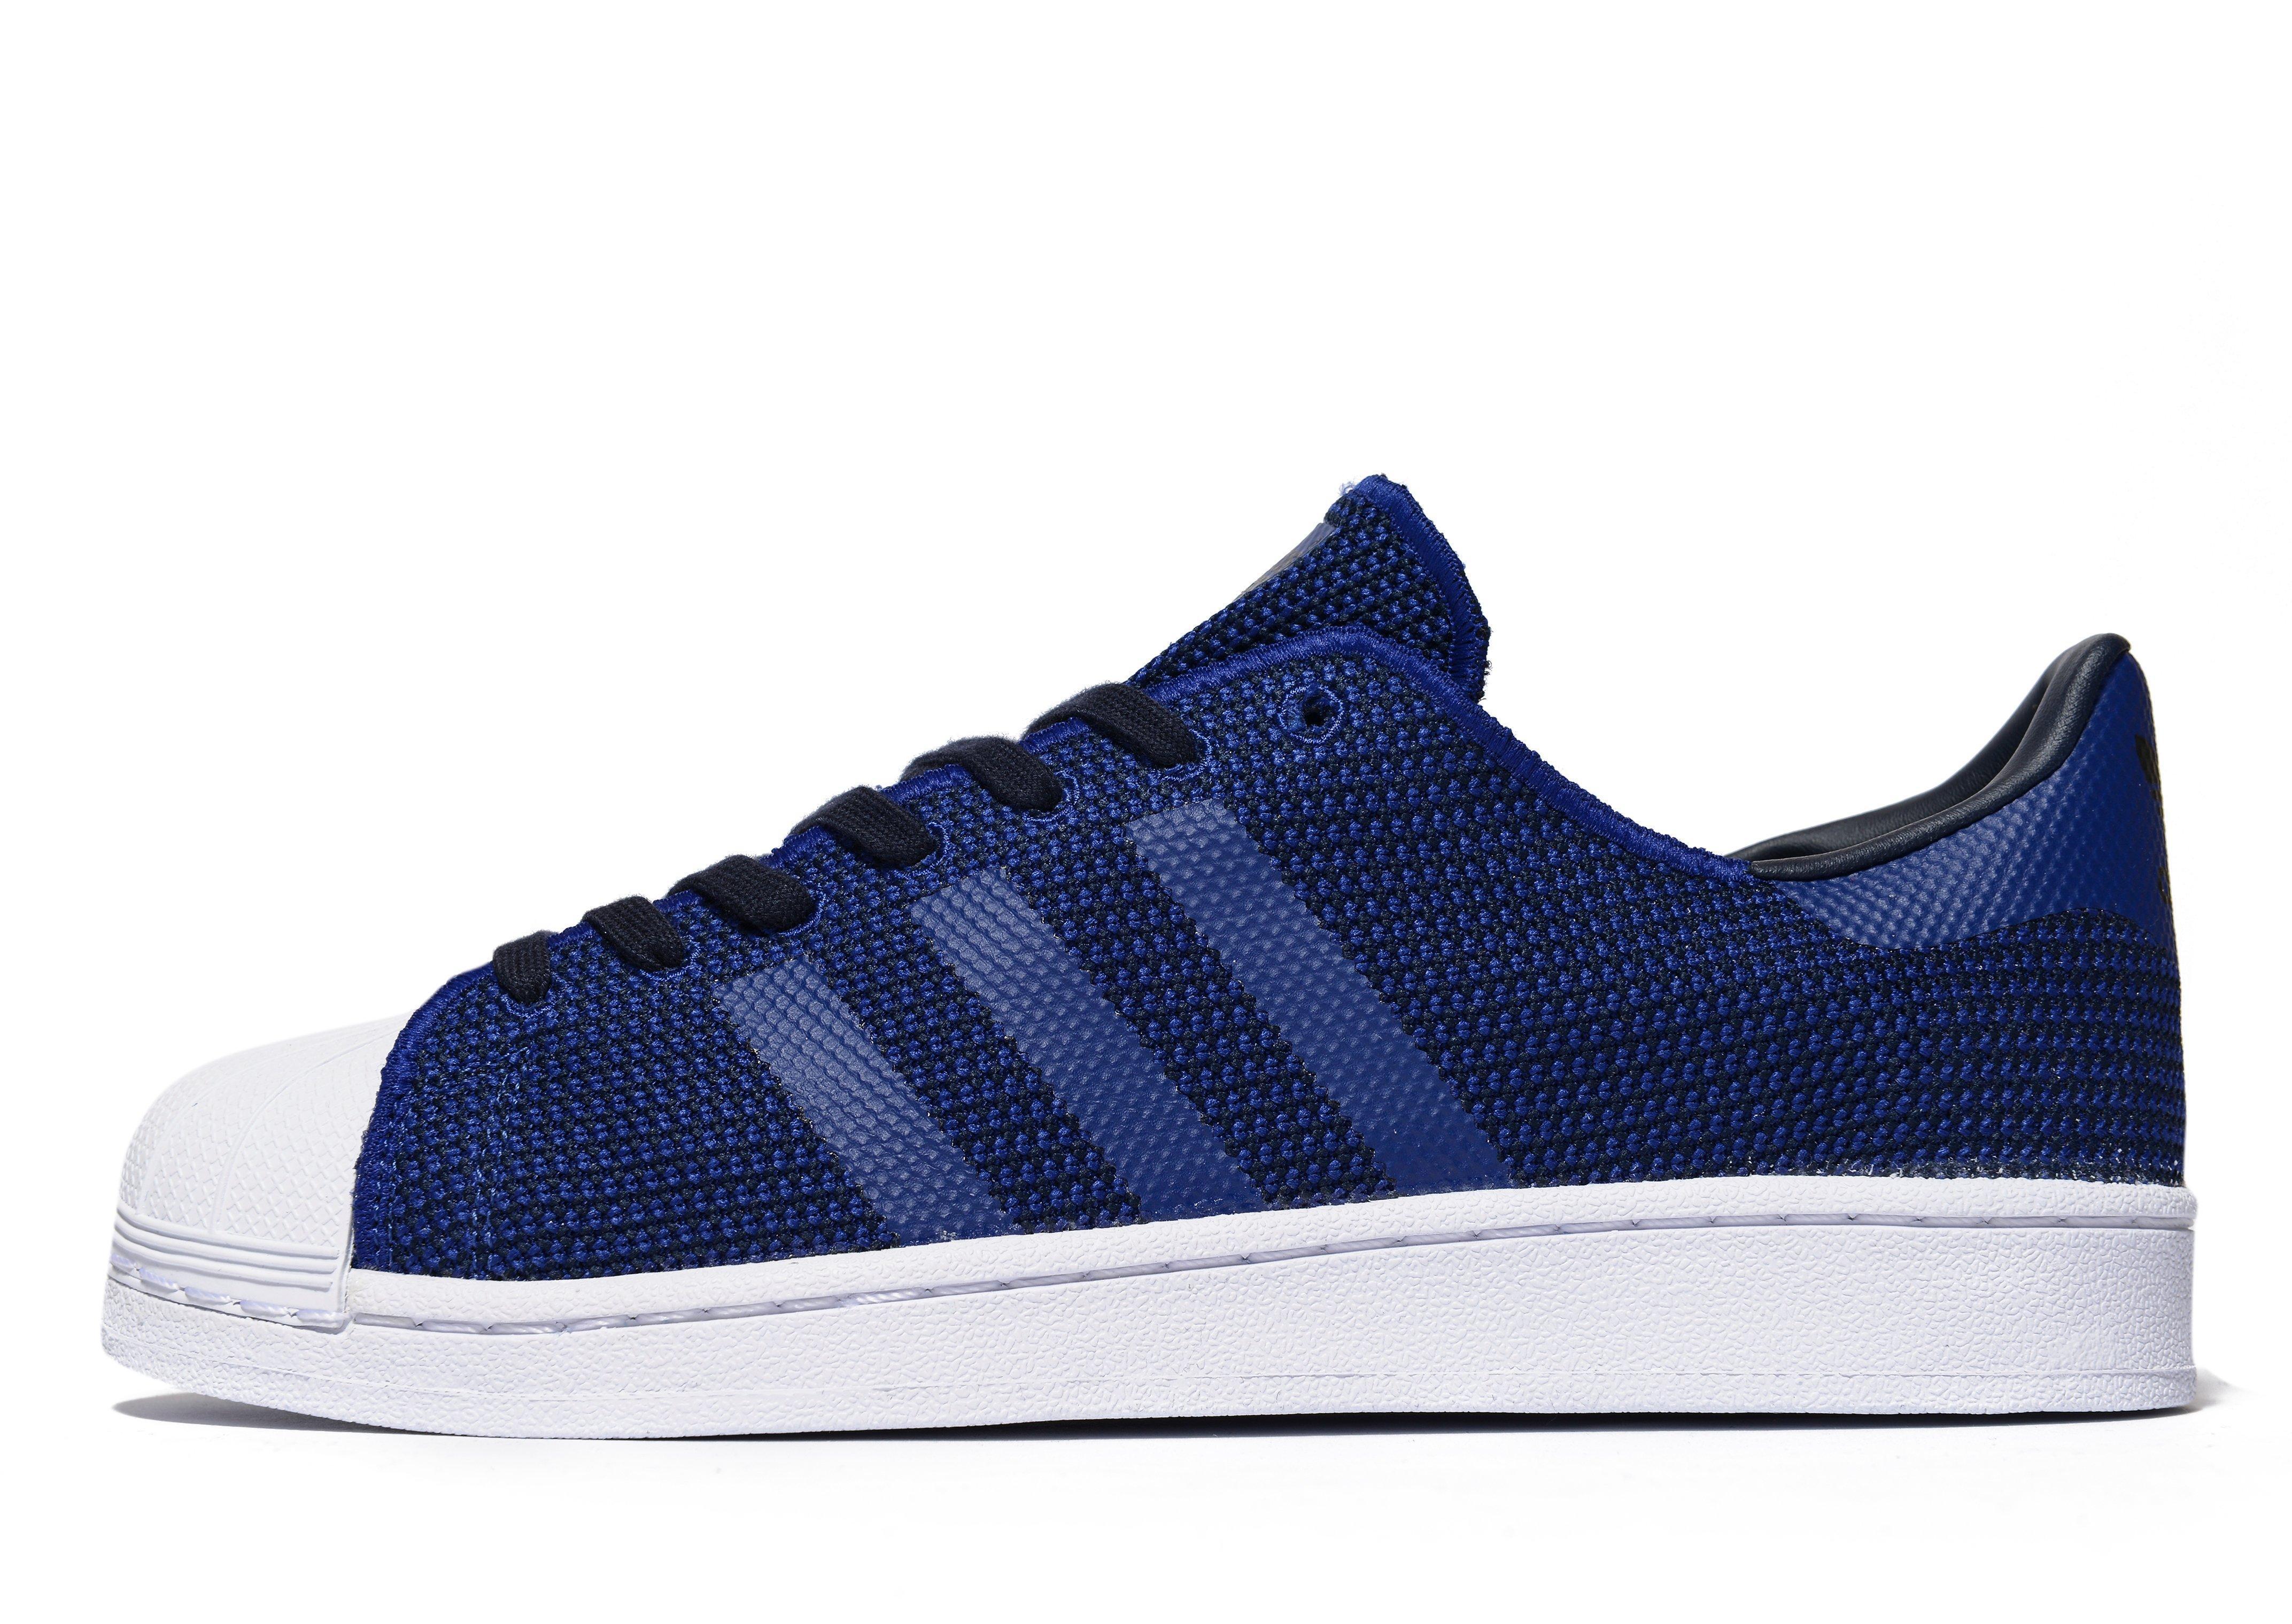 adidas Originals Rubber Superstar Knit in Blue for Men - Lyst